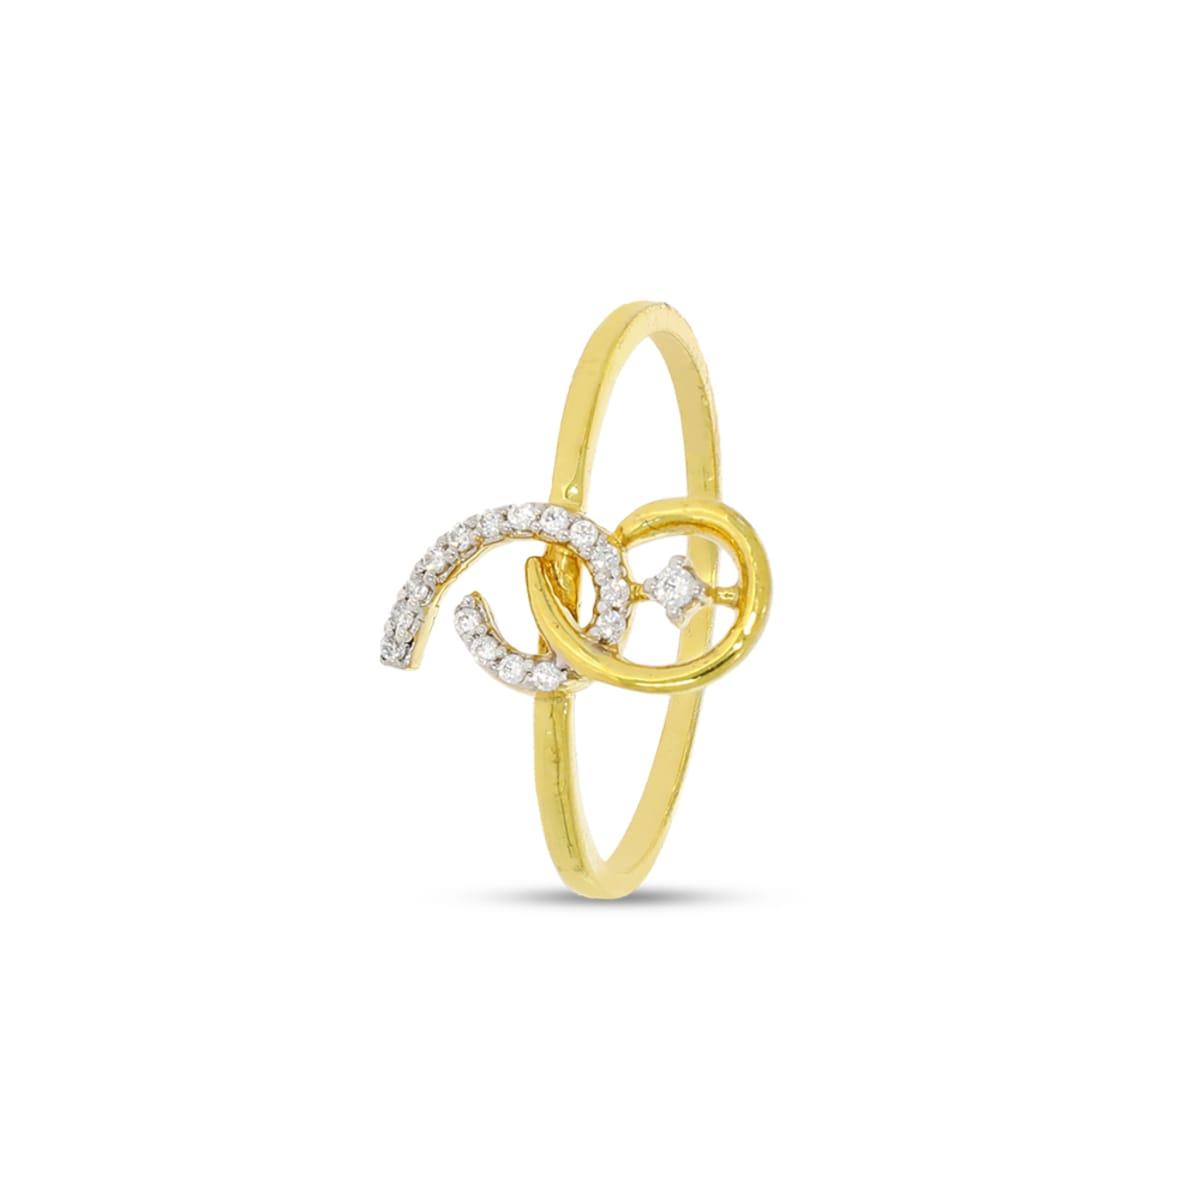 Doubel 6 Shape Real Diamond Ring